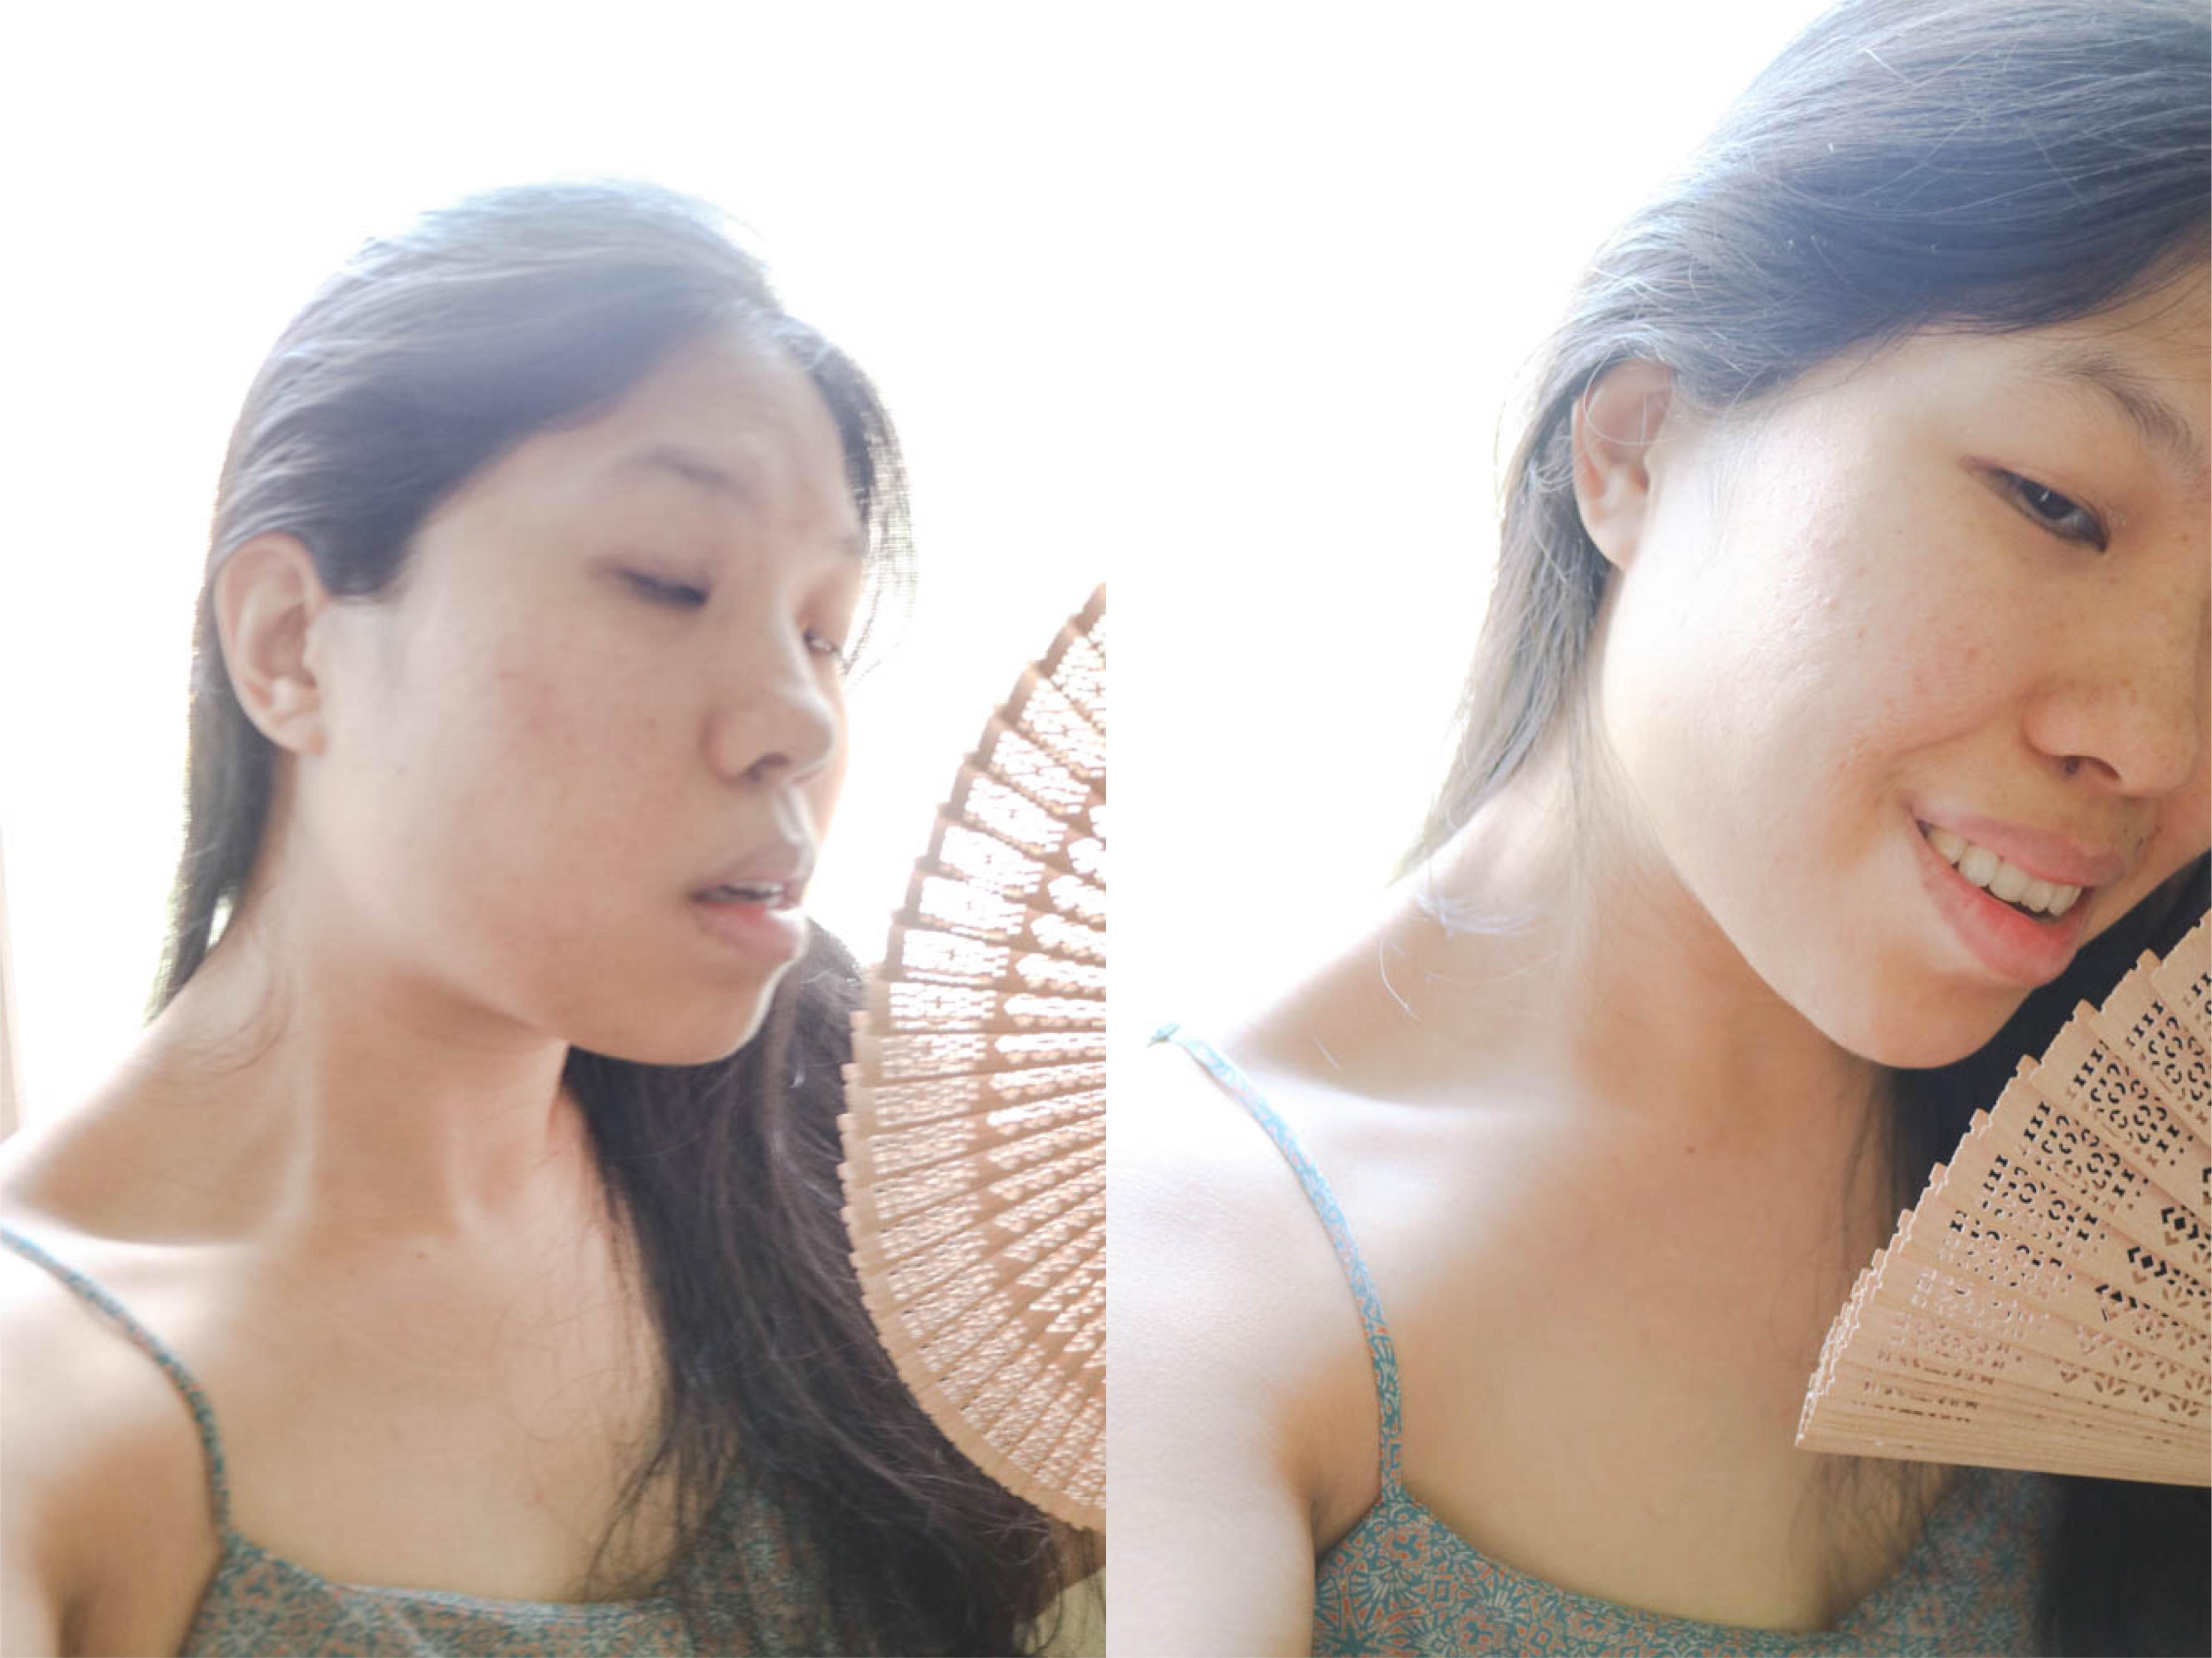 AndreaMai_Selfie4